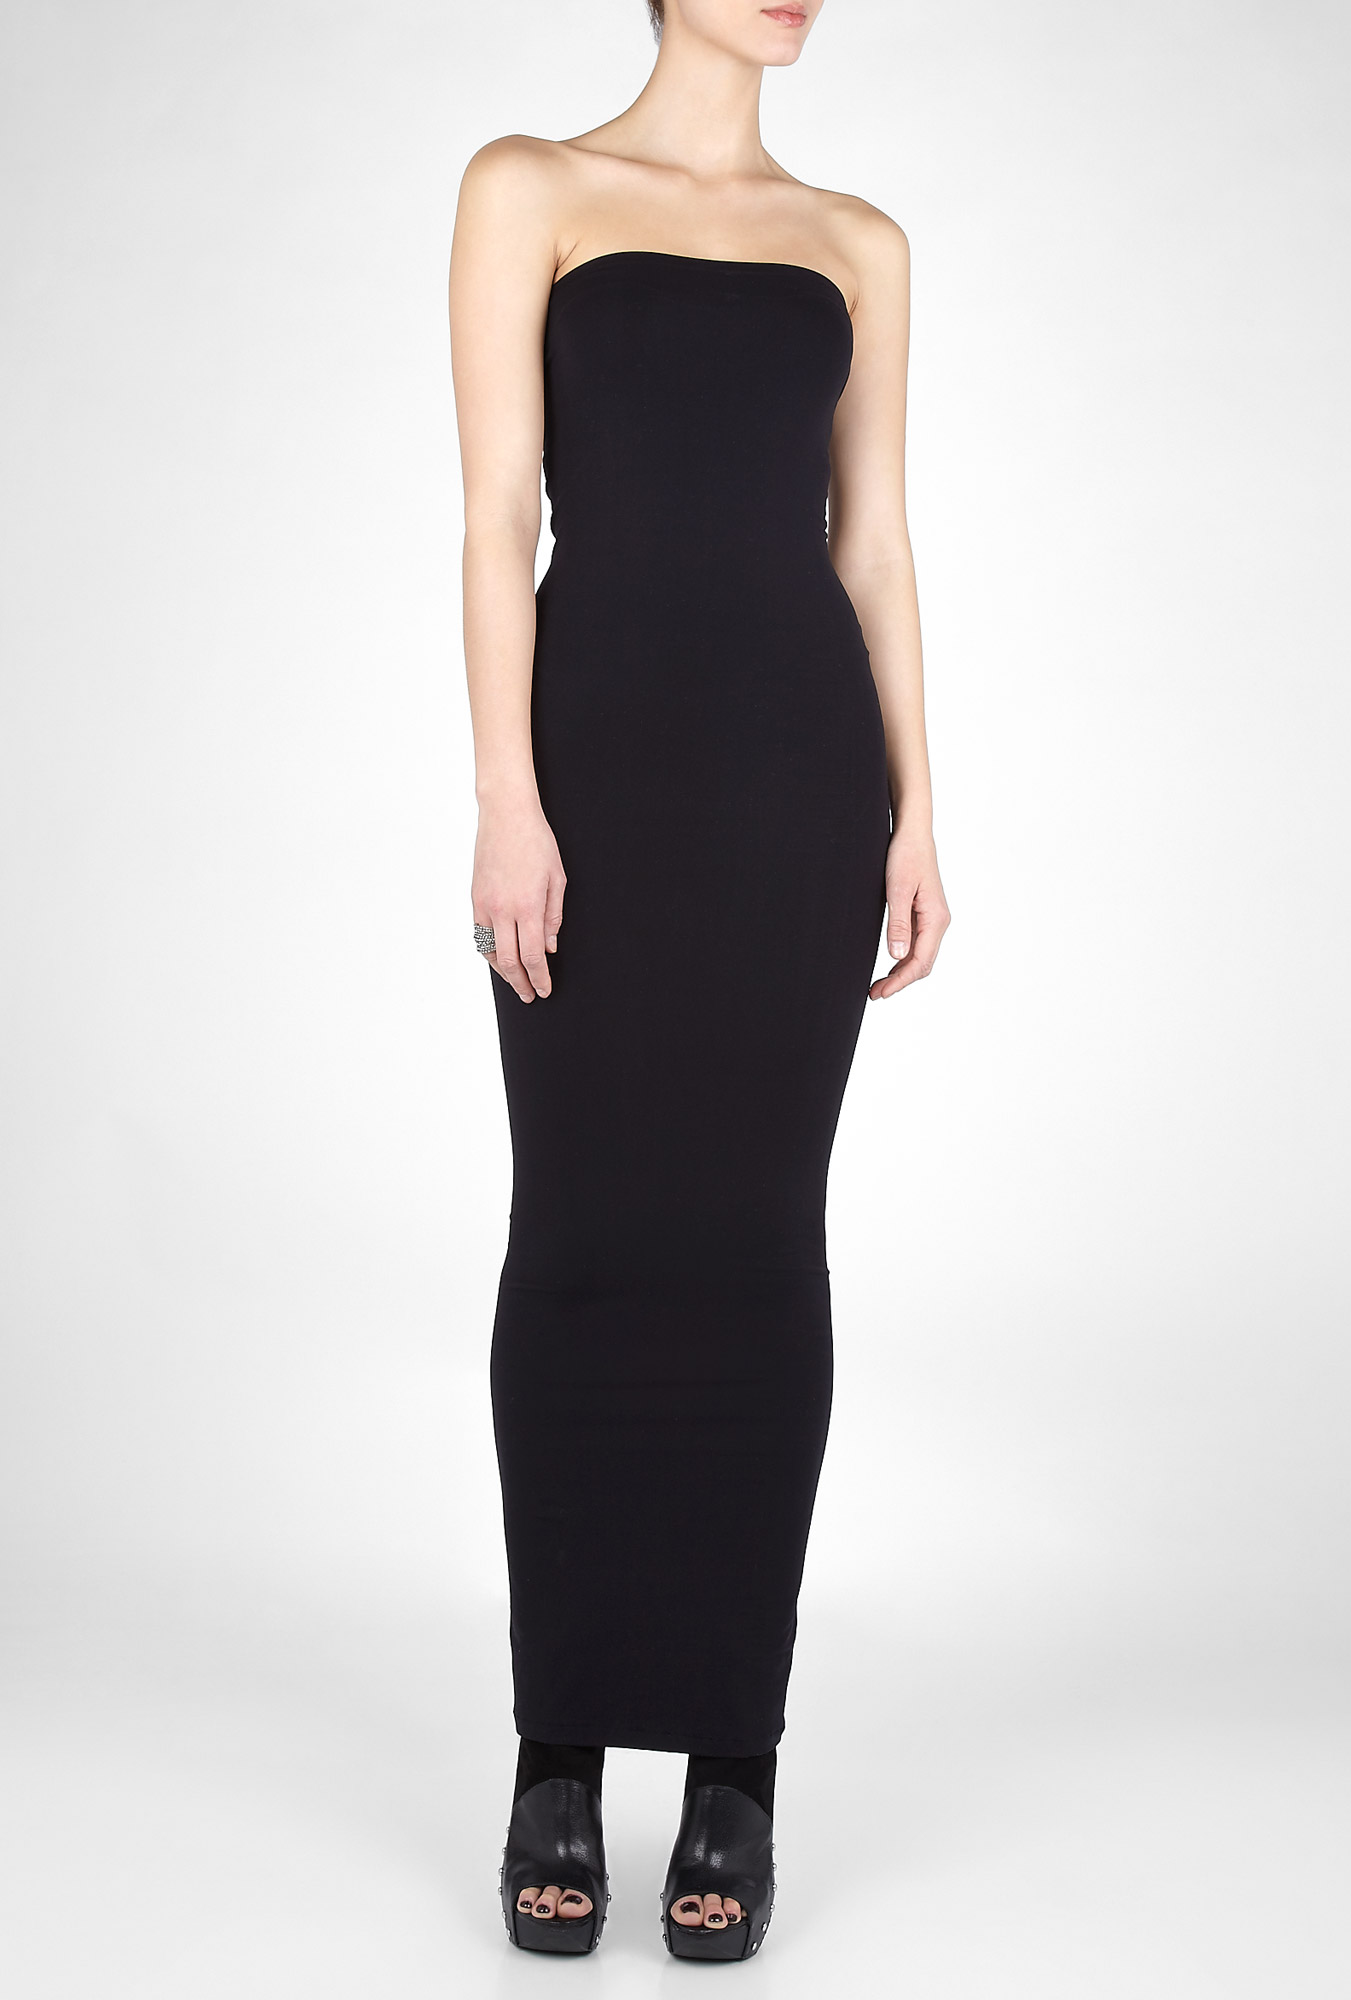 Acne Studios Black Long Tube Dress In Black Lyst